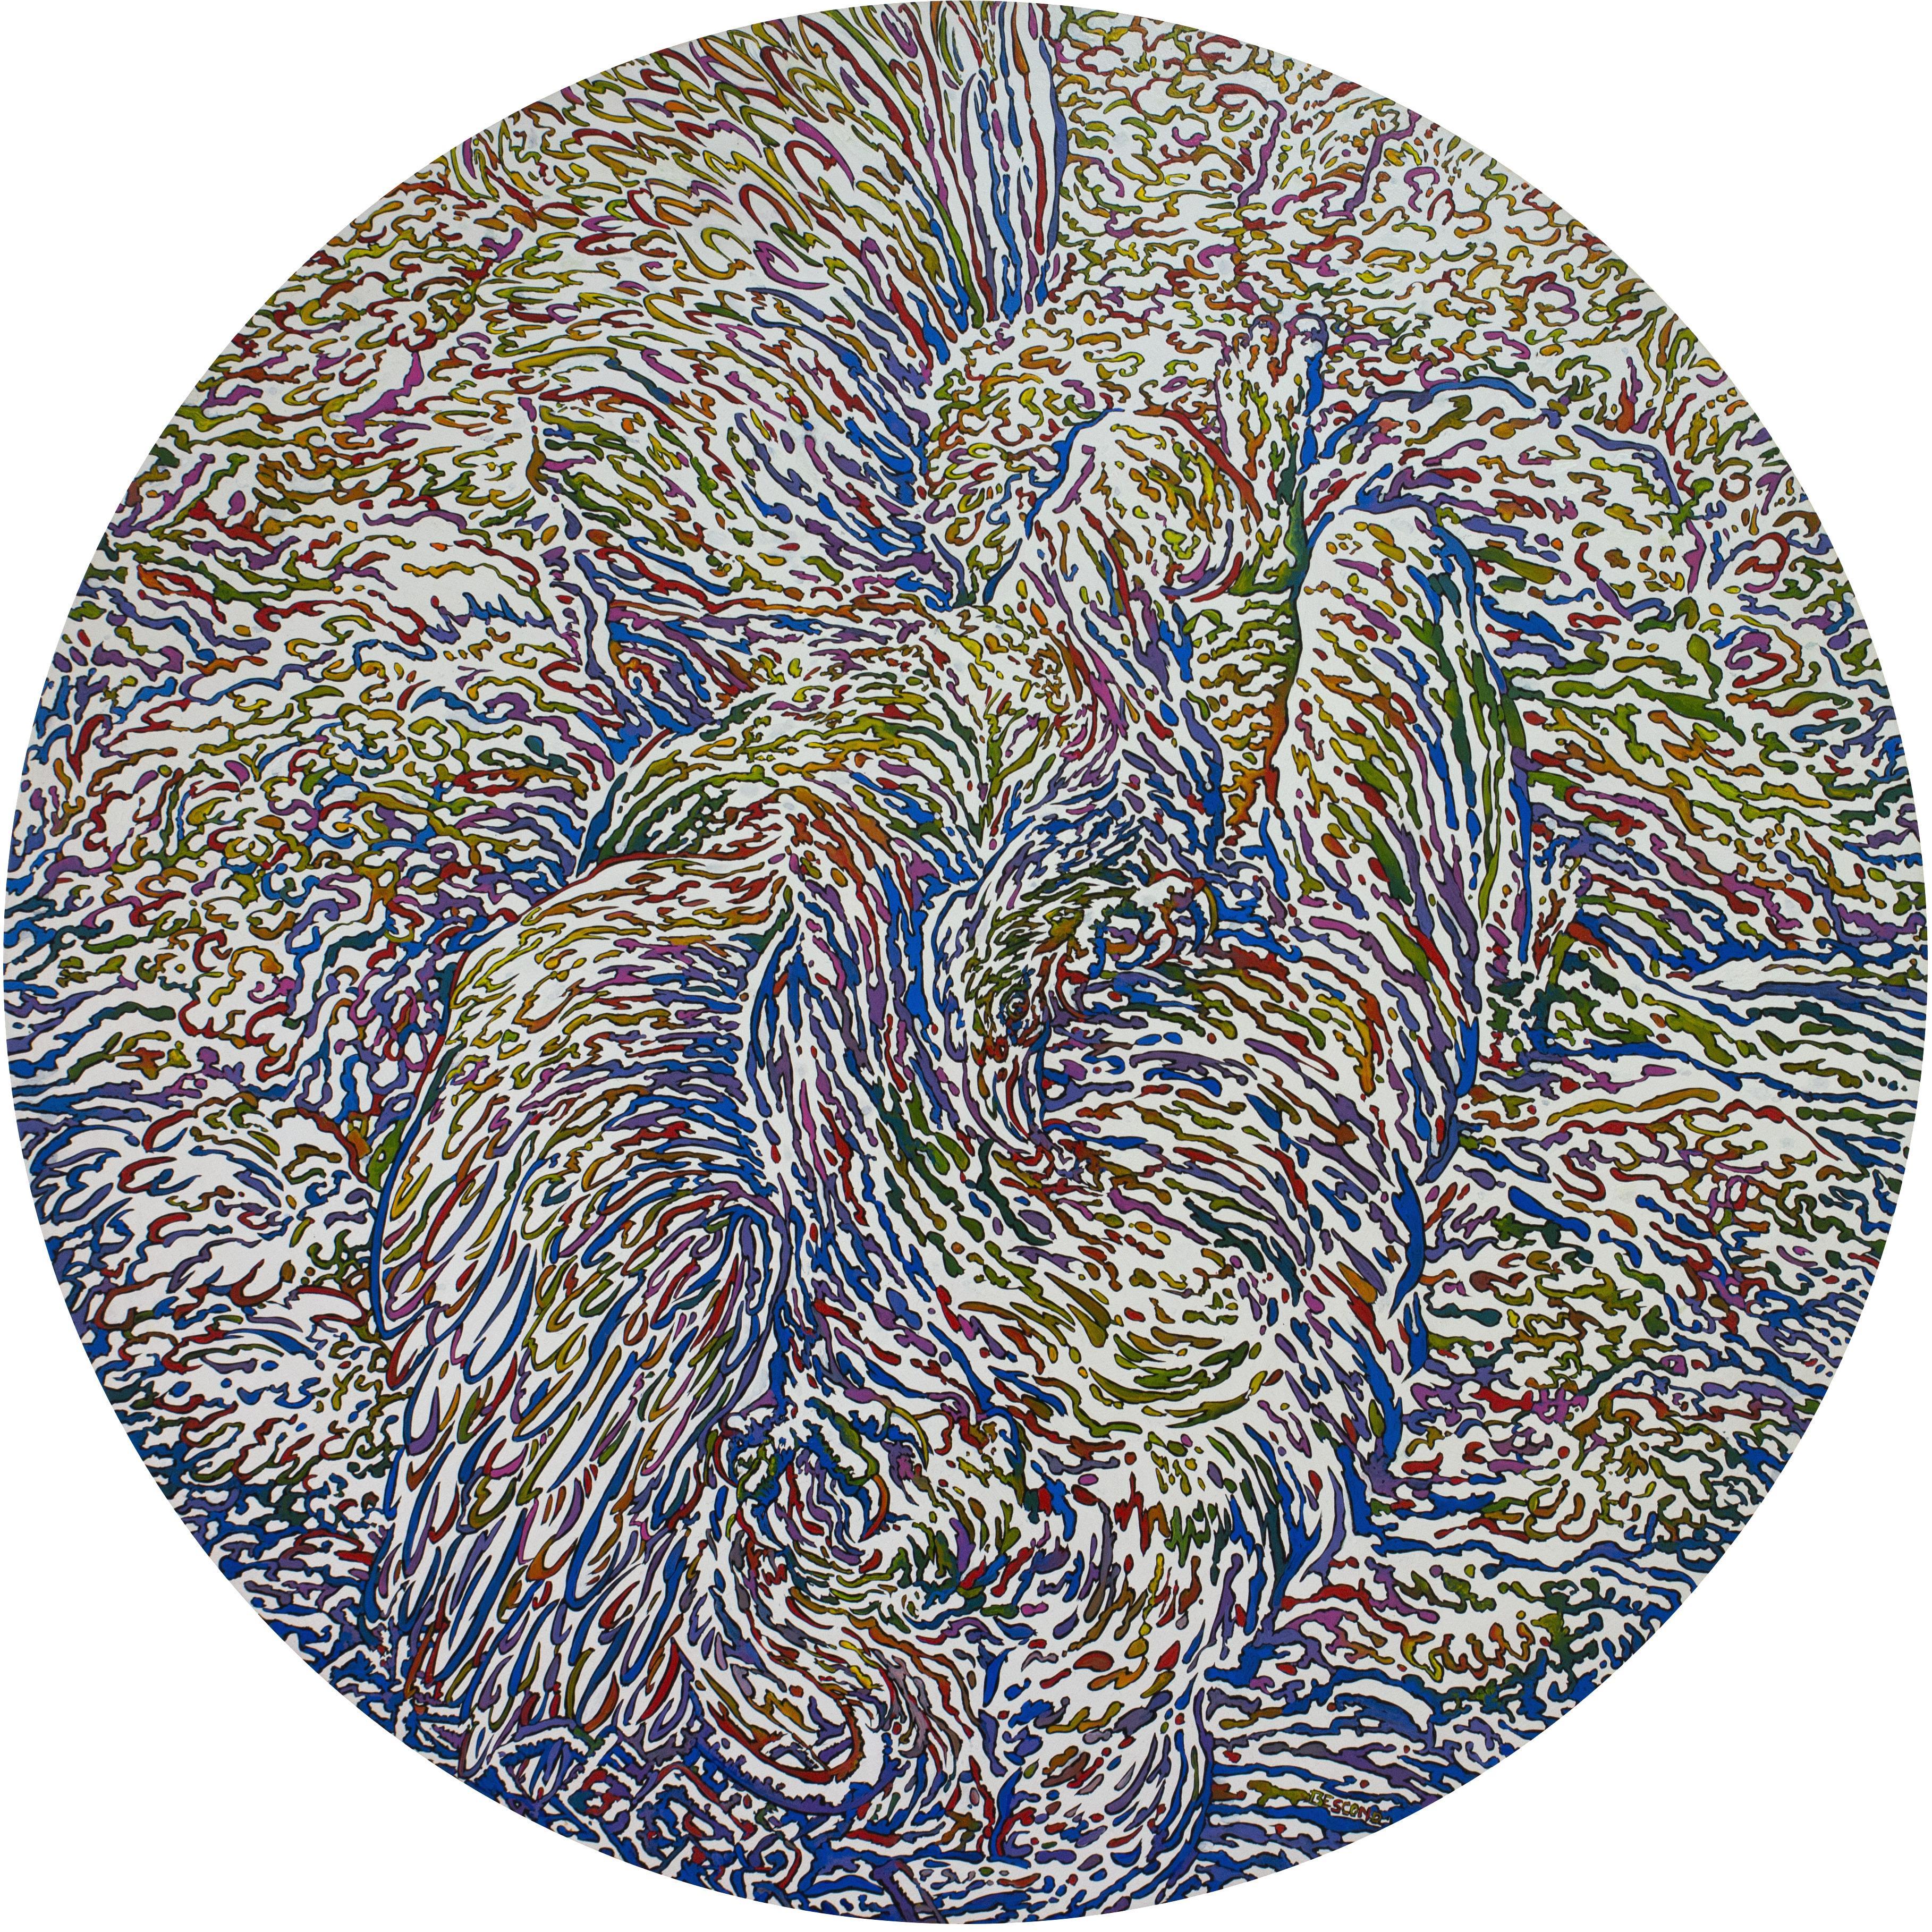 """Prométhée 4"", Eagle Devouring Mythological Hero Large Circular Acrylic Painting"